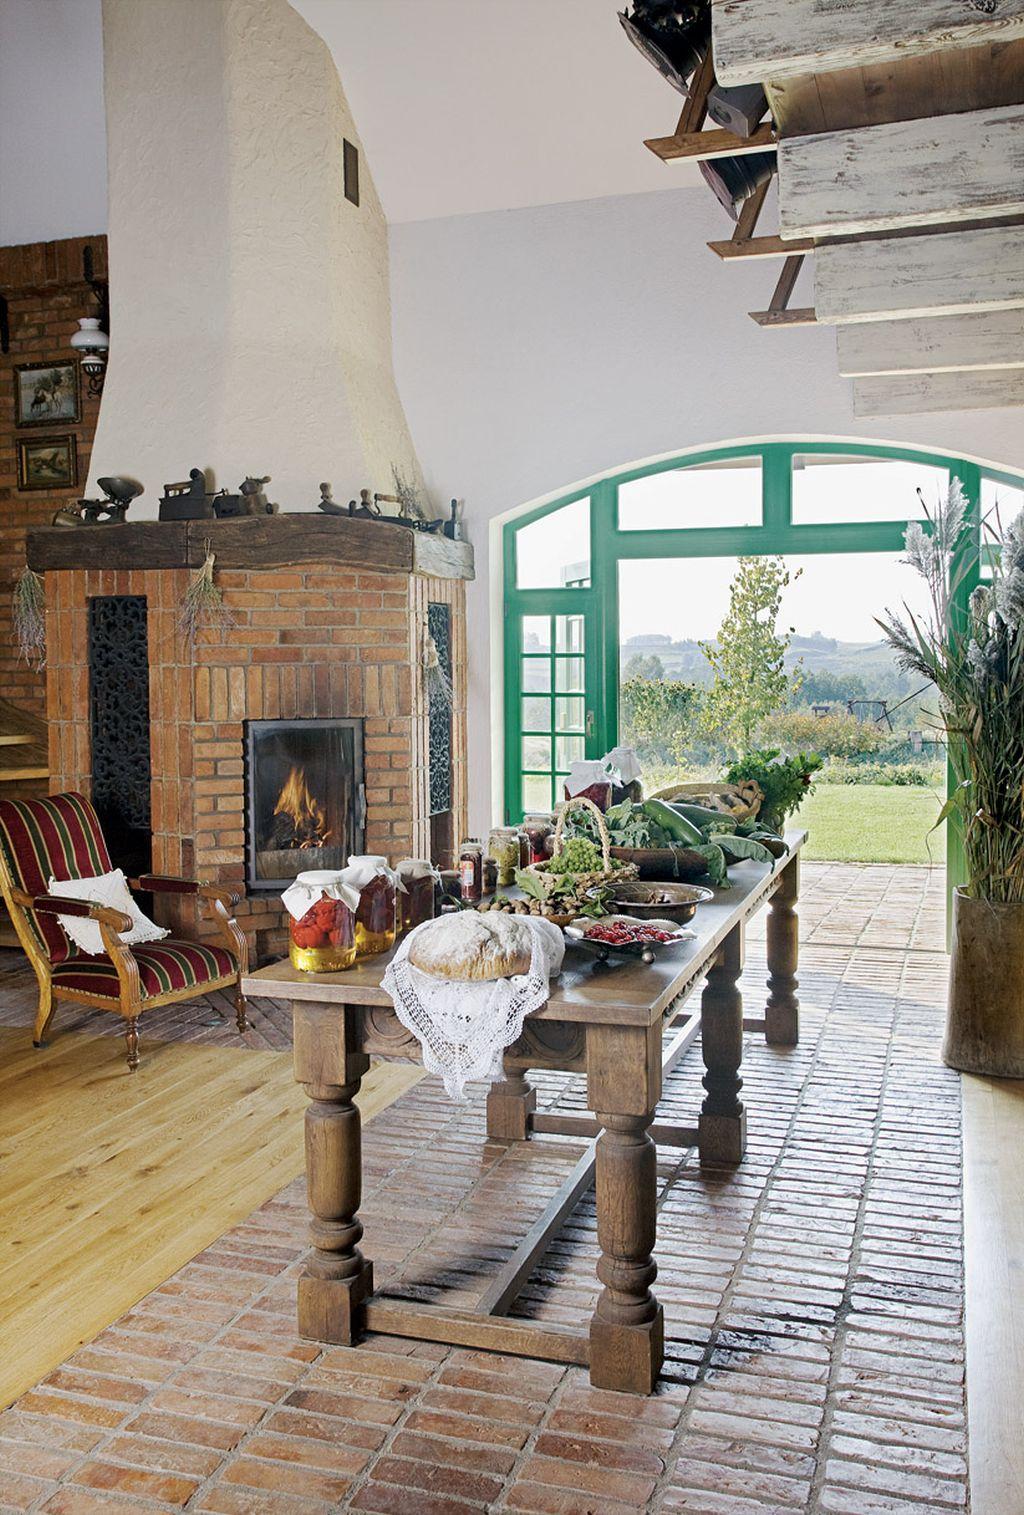 adelaparvu.com despre Koneser House Foto Jan Brykczynski (11)